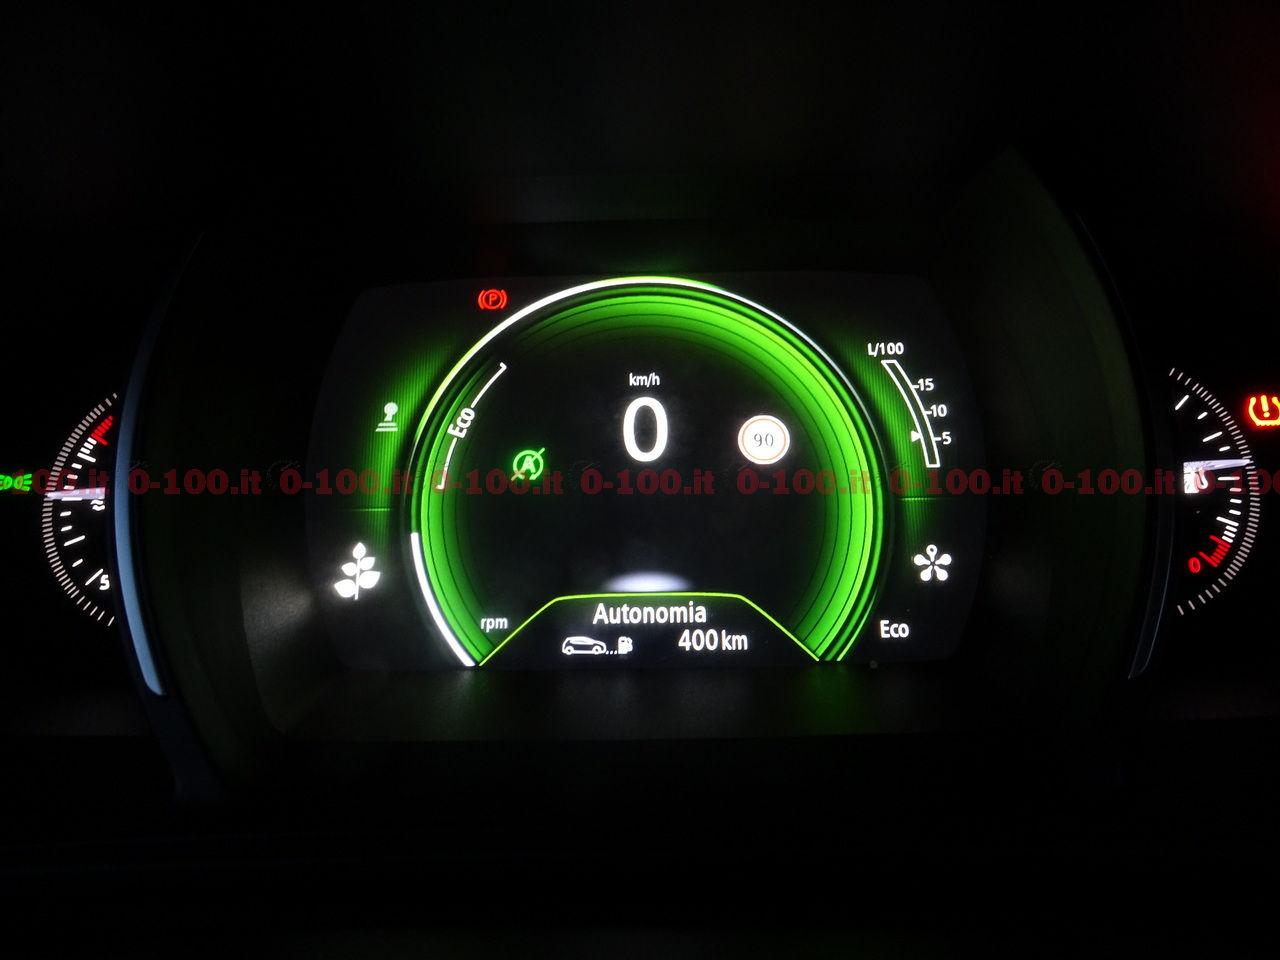 Renault-Megane-GT-Bose-dCi-130-test-prova-opinioni_0-100_41